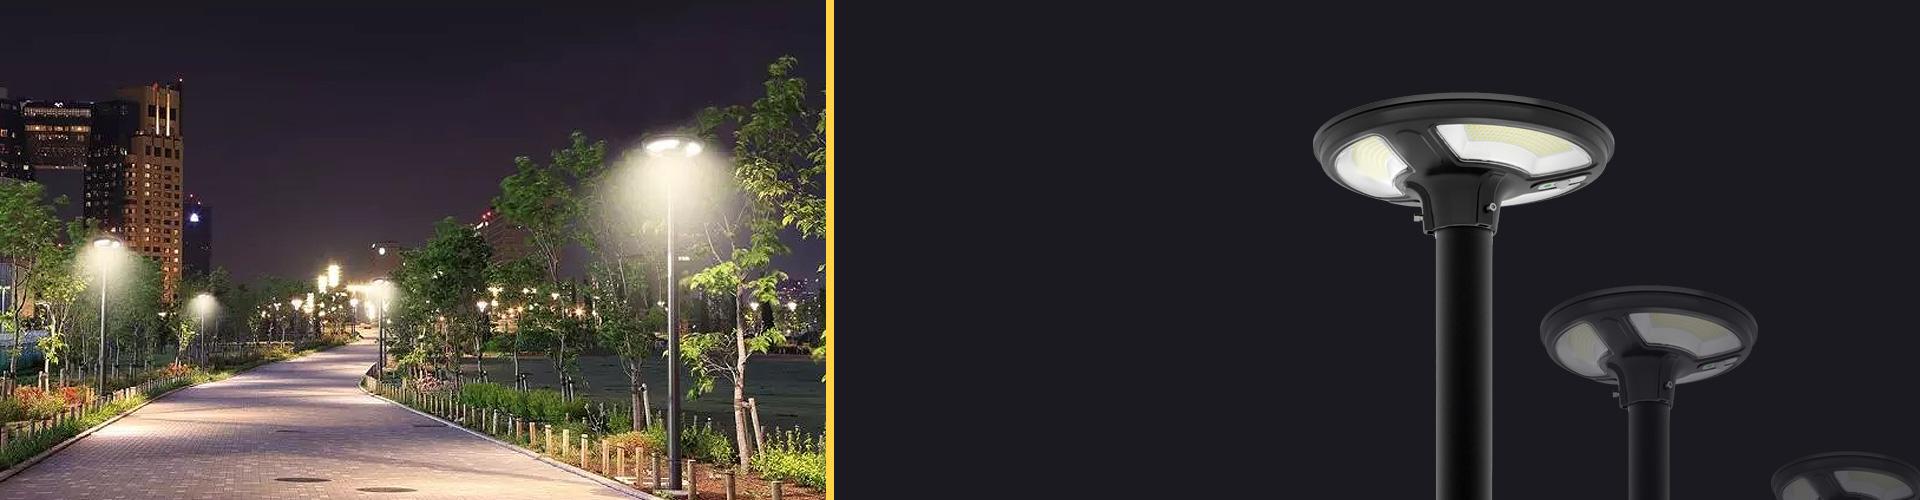 solar-lights-bg